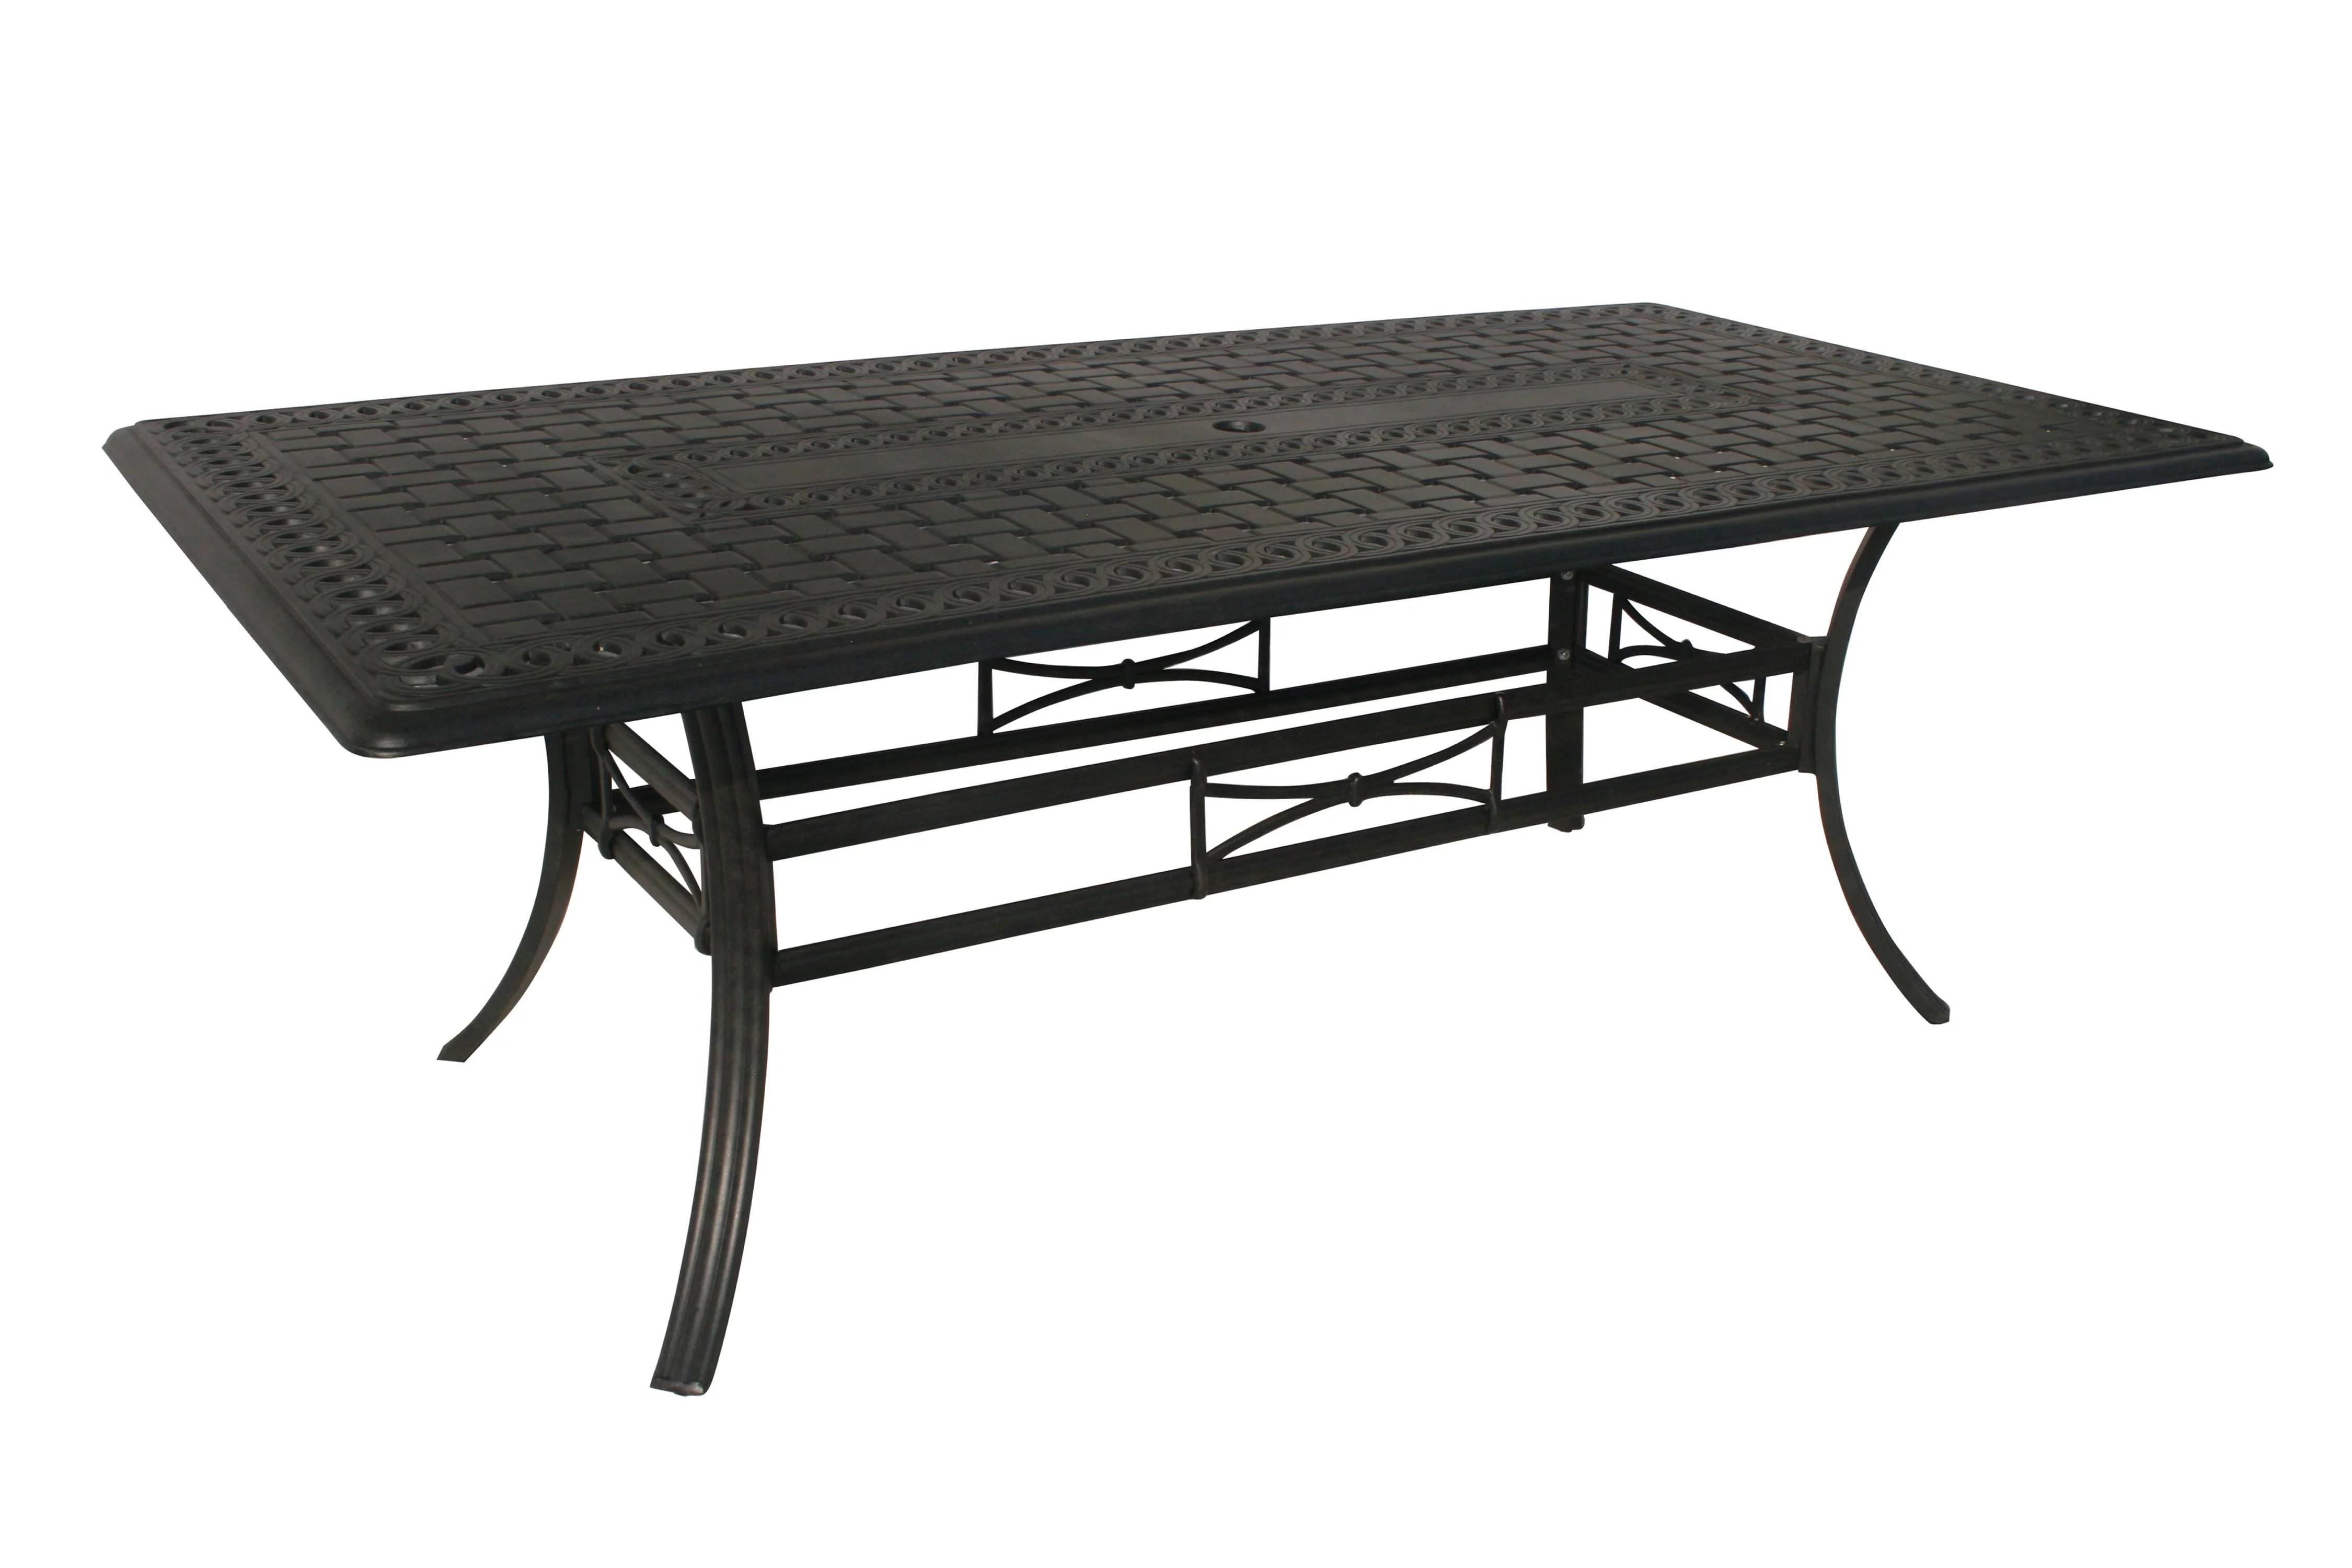 84 jet black rectangular aluminum outdoor patio dining table w umbrella hole walmart com